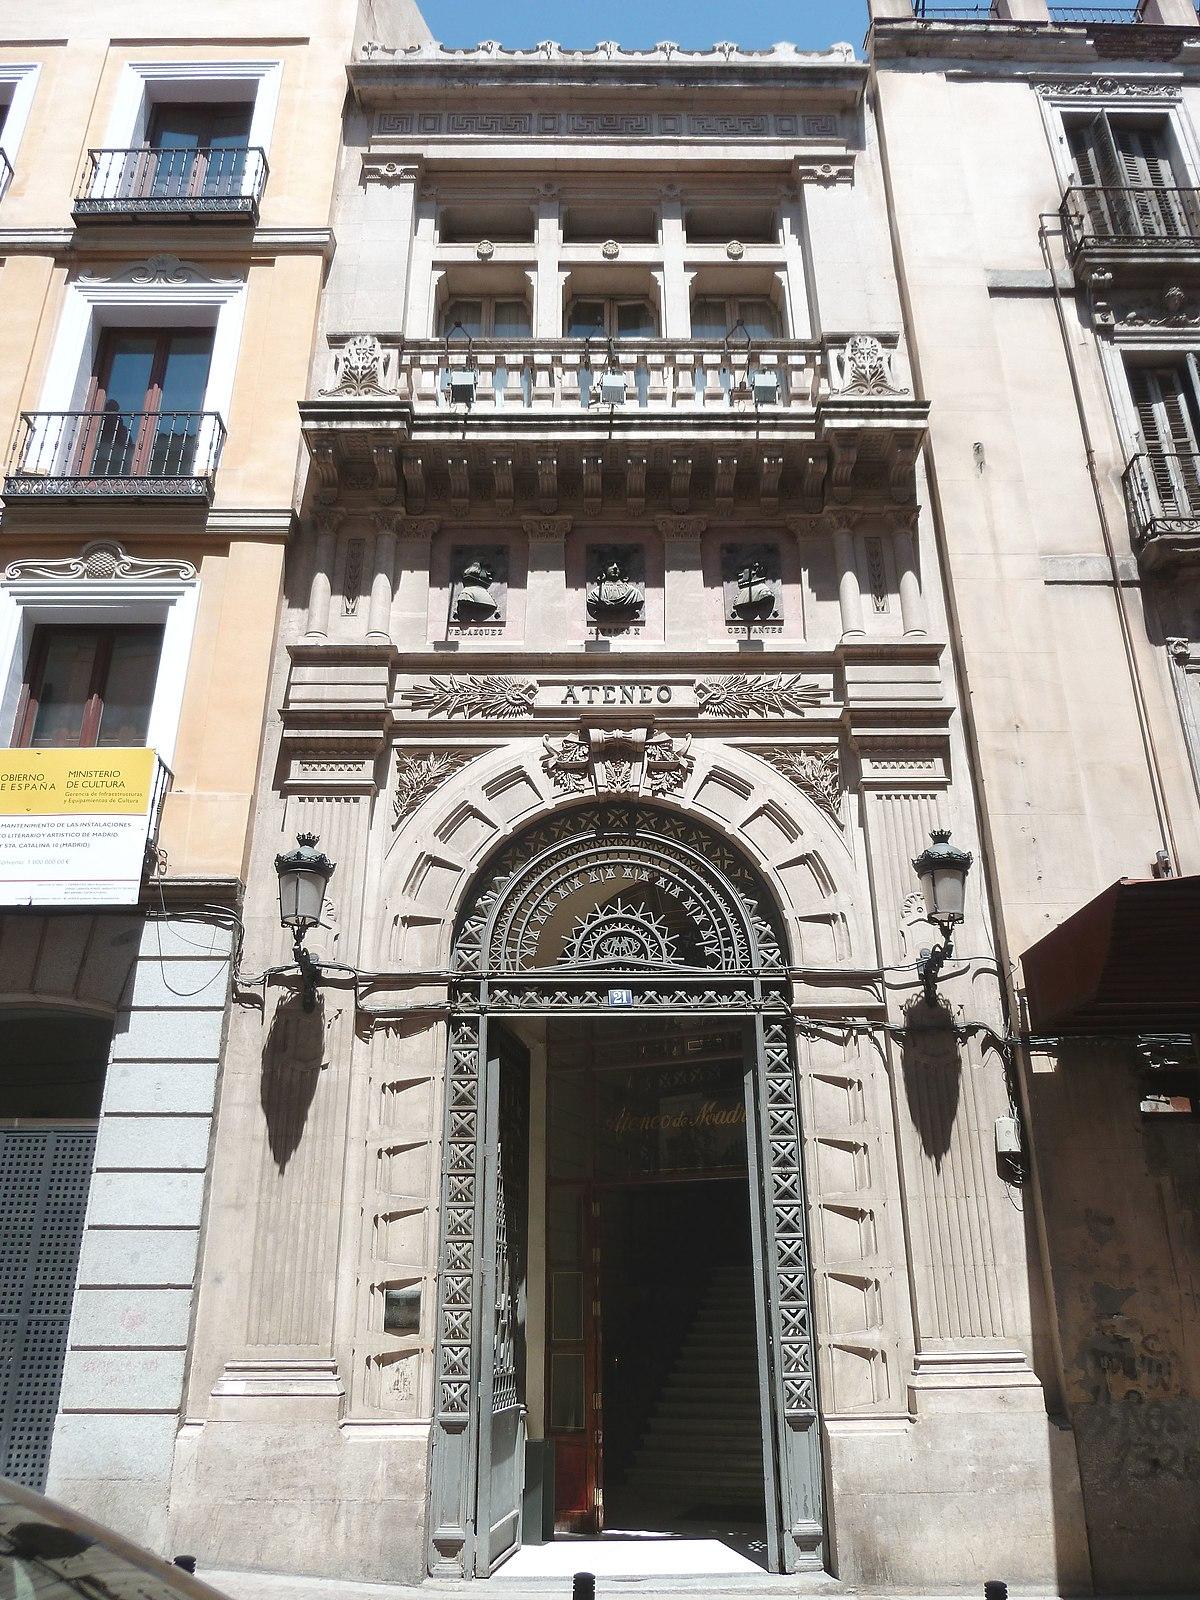 Ateneo de madrid wikipedia la enciclopedia libre for Calle prado jerez 3 navacerrada